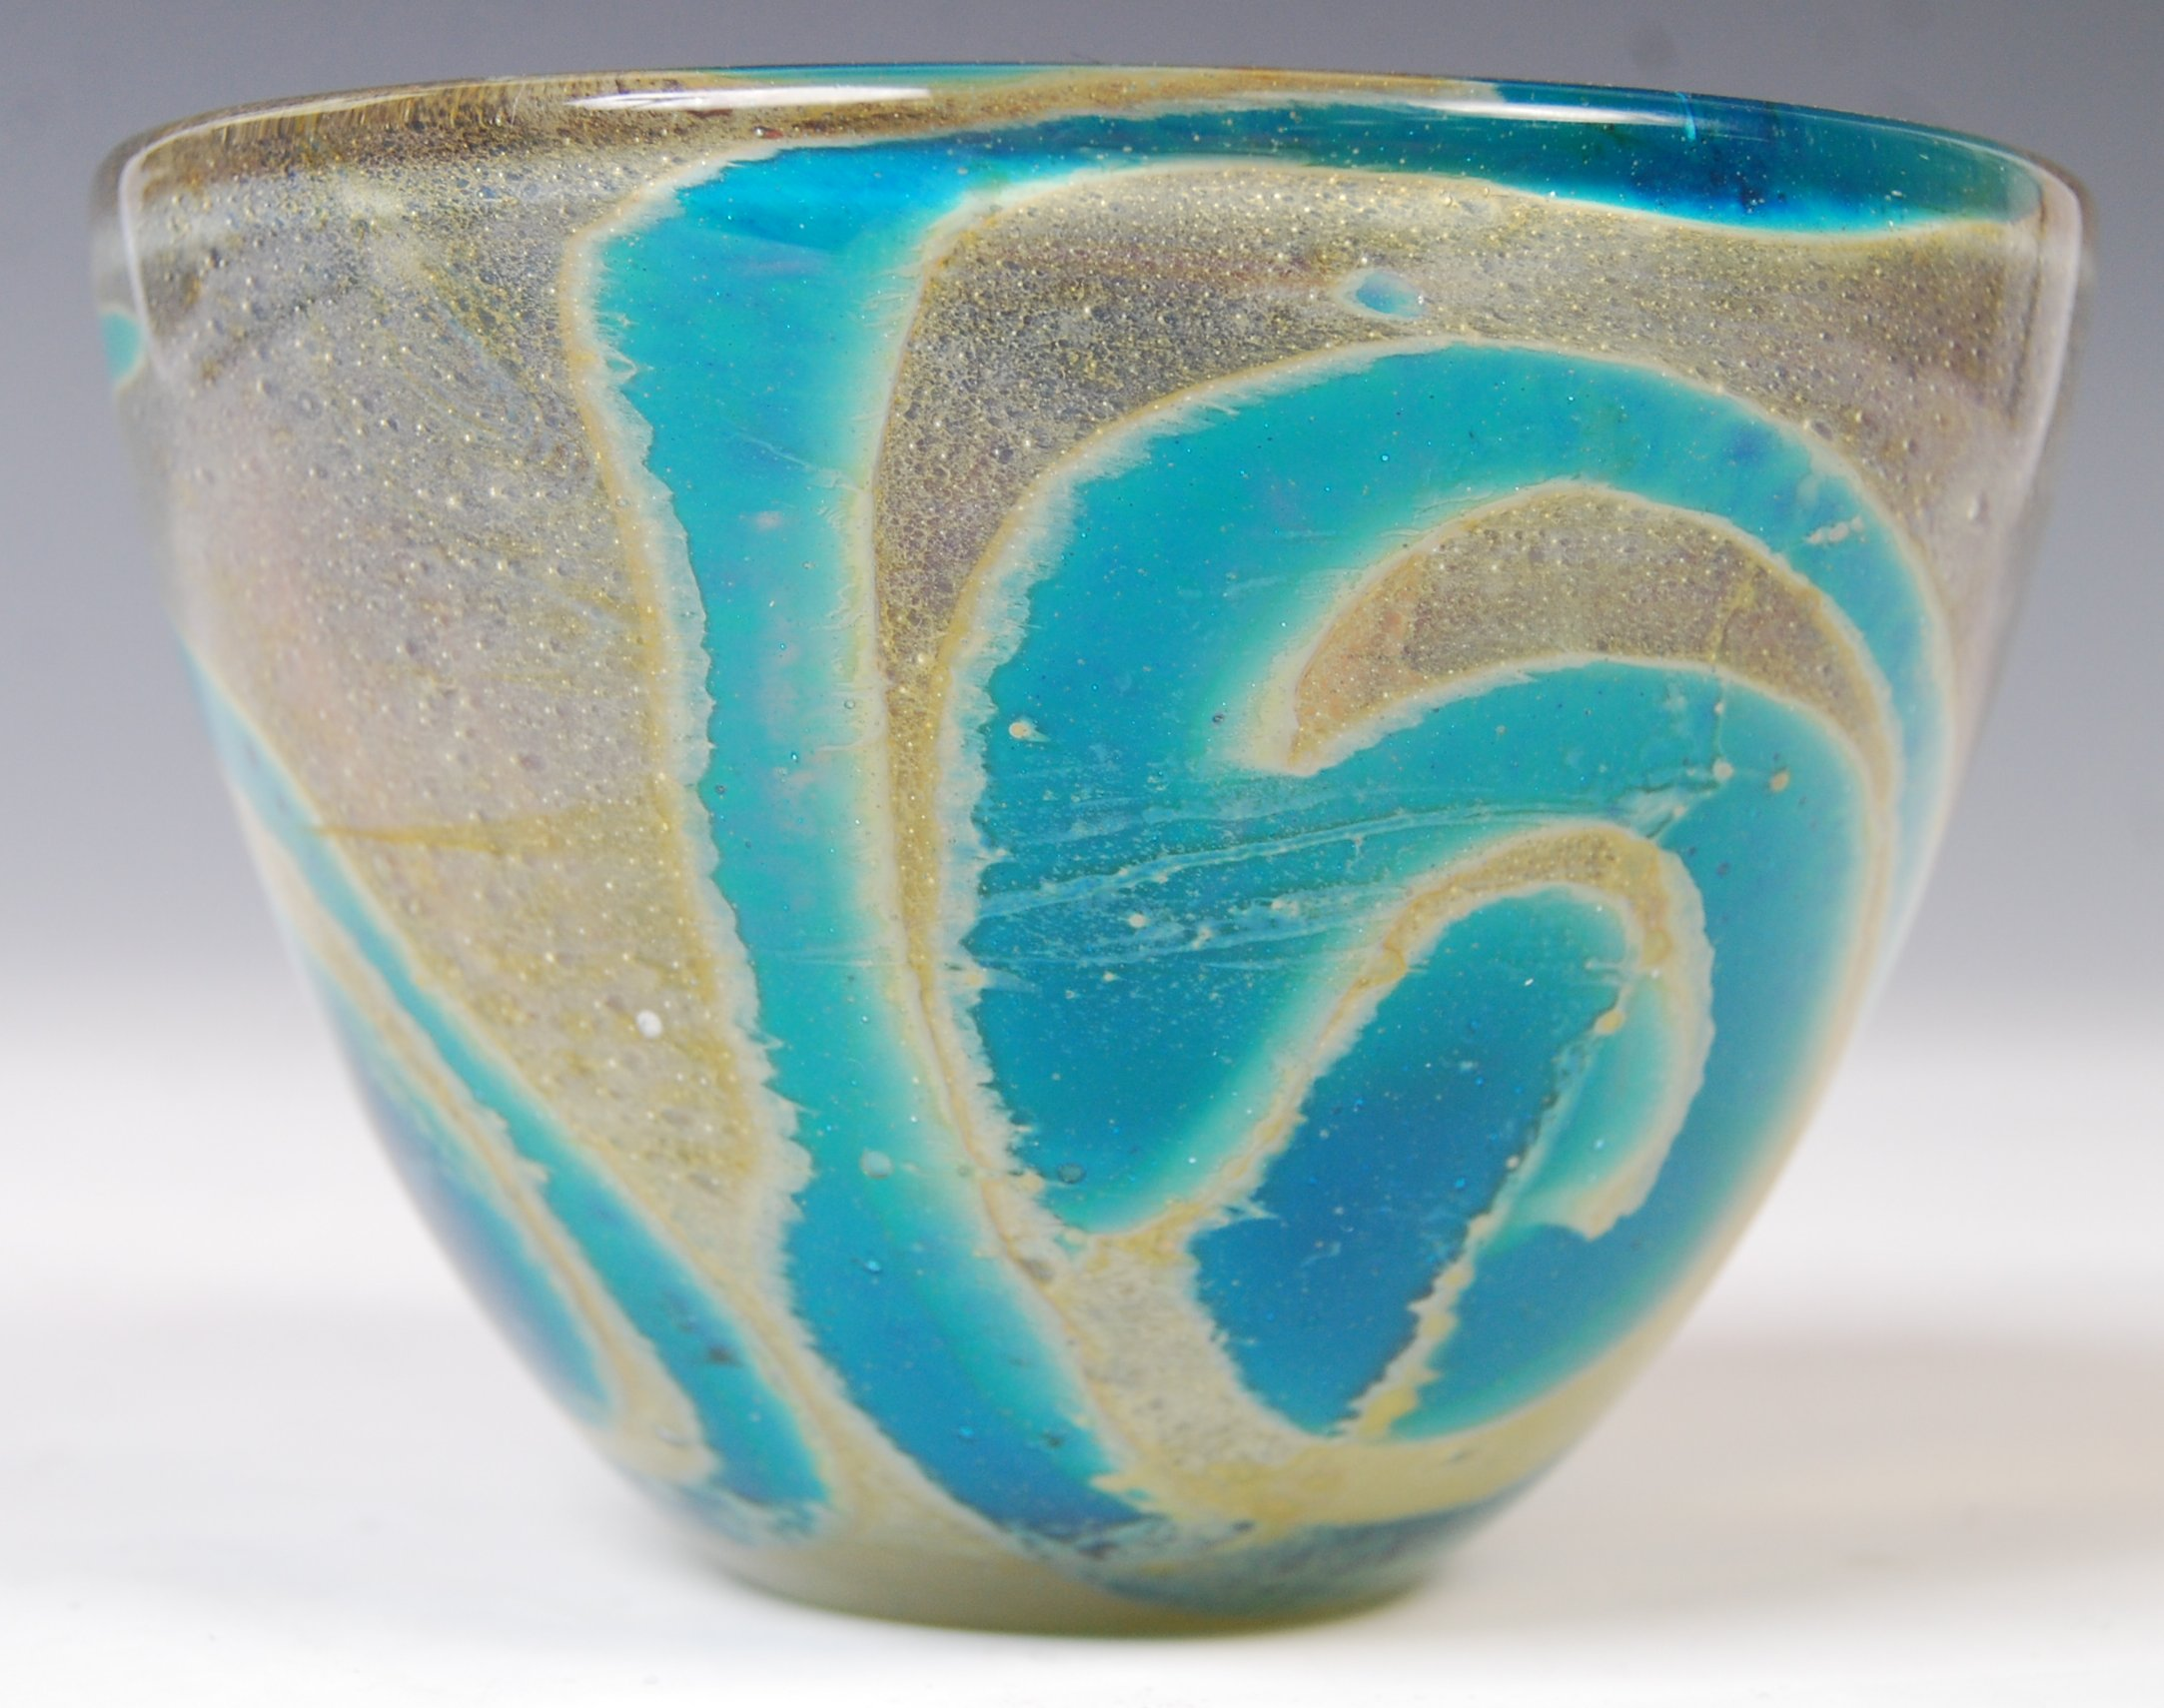 Lot 7 - MDINA STUDIO ART GLASS BOWL / VASE BY MICHAEL HARRIS